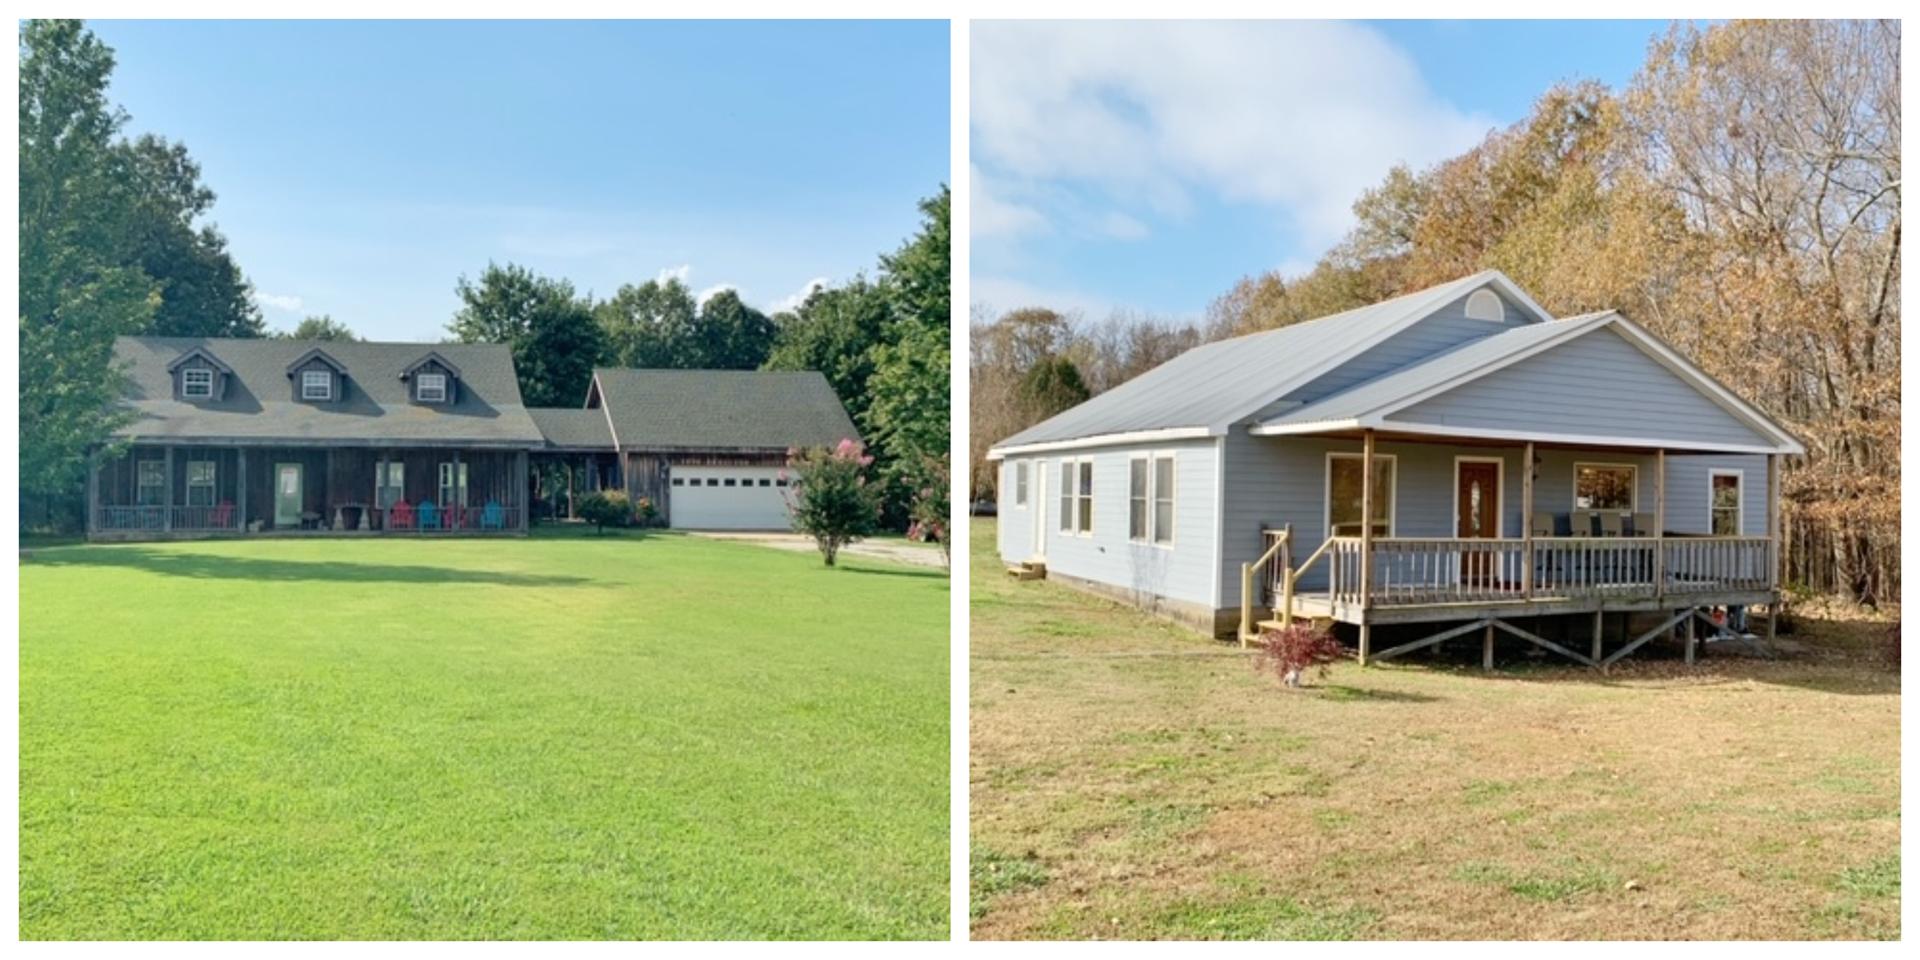 Jonesboro AR 2 Country Homes with Acreage For Sale